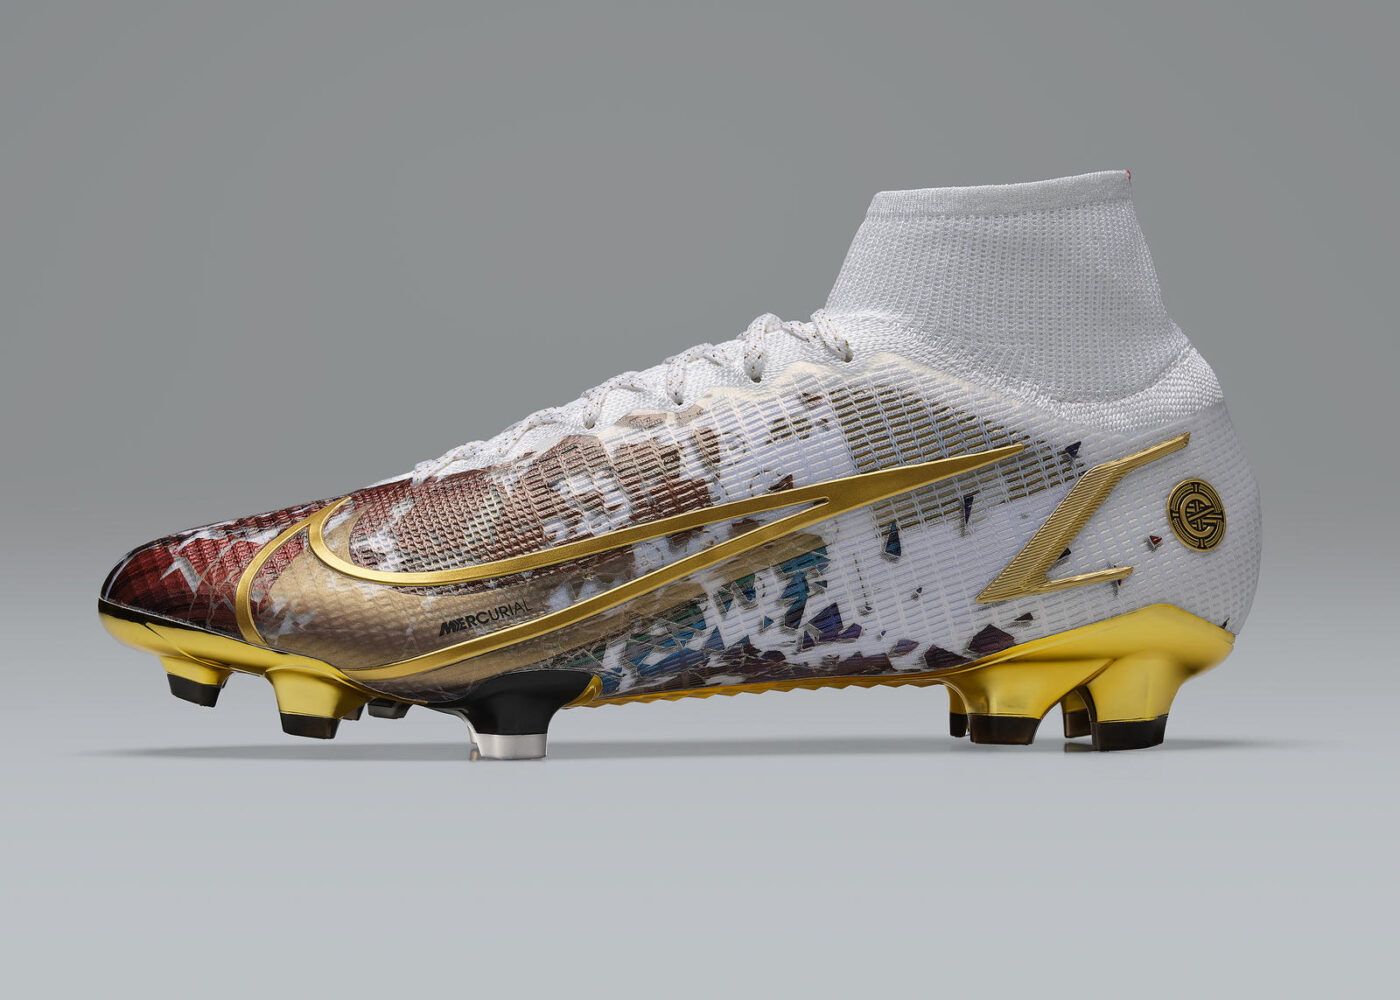 Chaussures Cristiano Ronaldo Nike record 110 buts